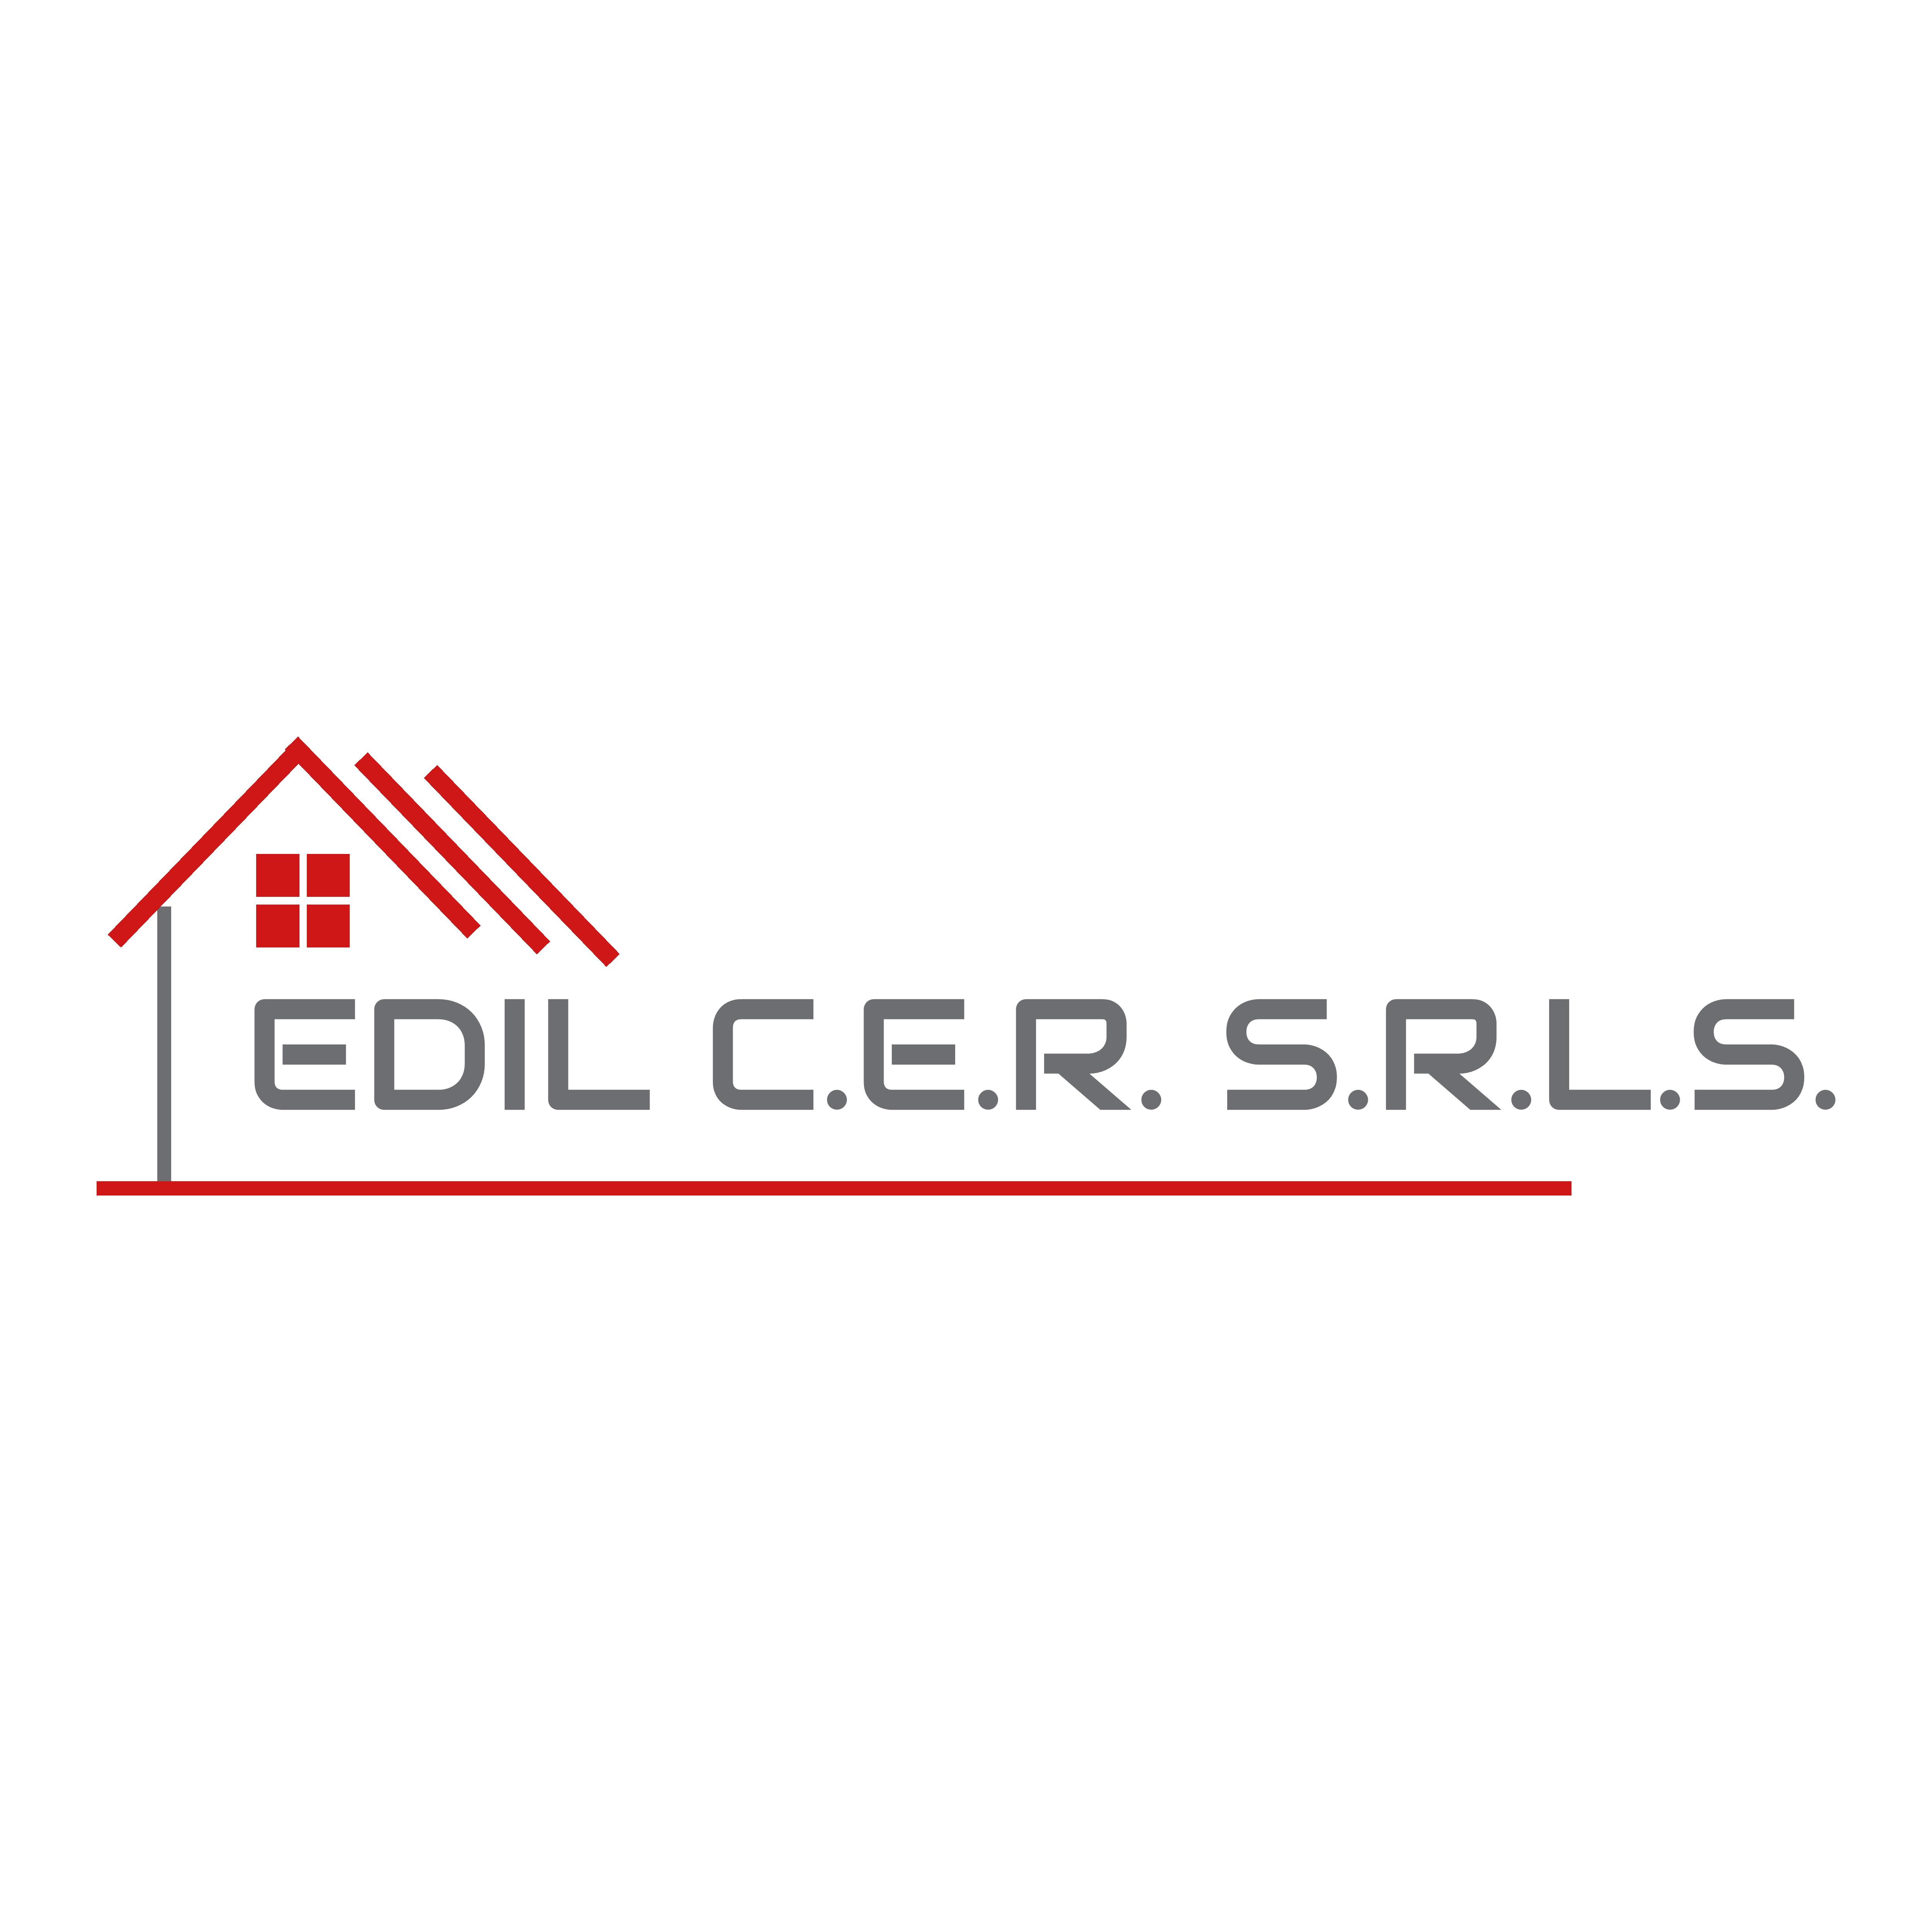 Edil C.E.R. S.r.l.s.